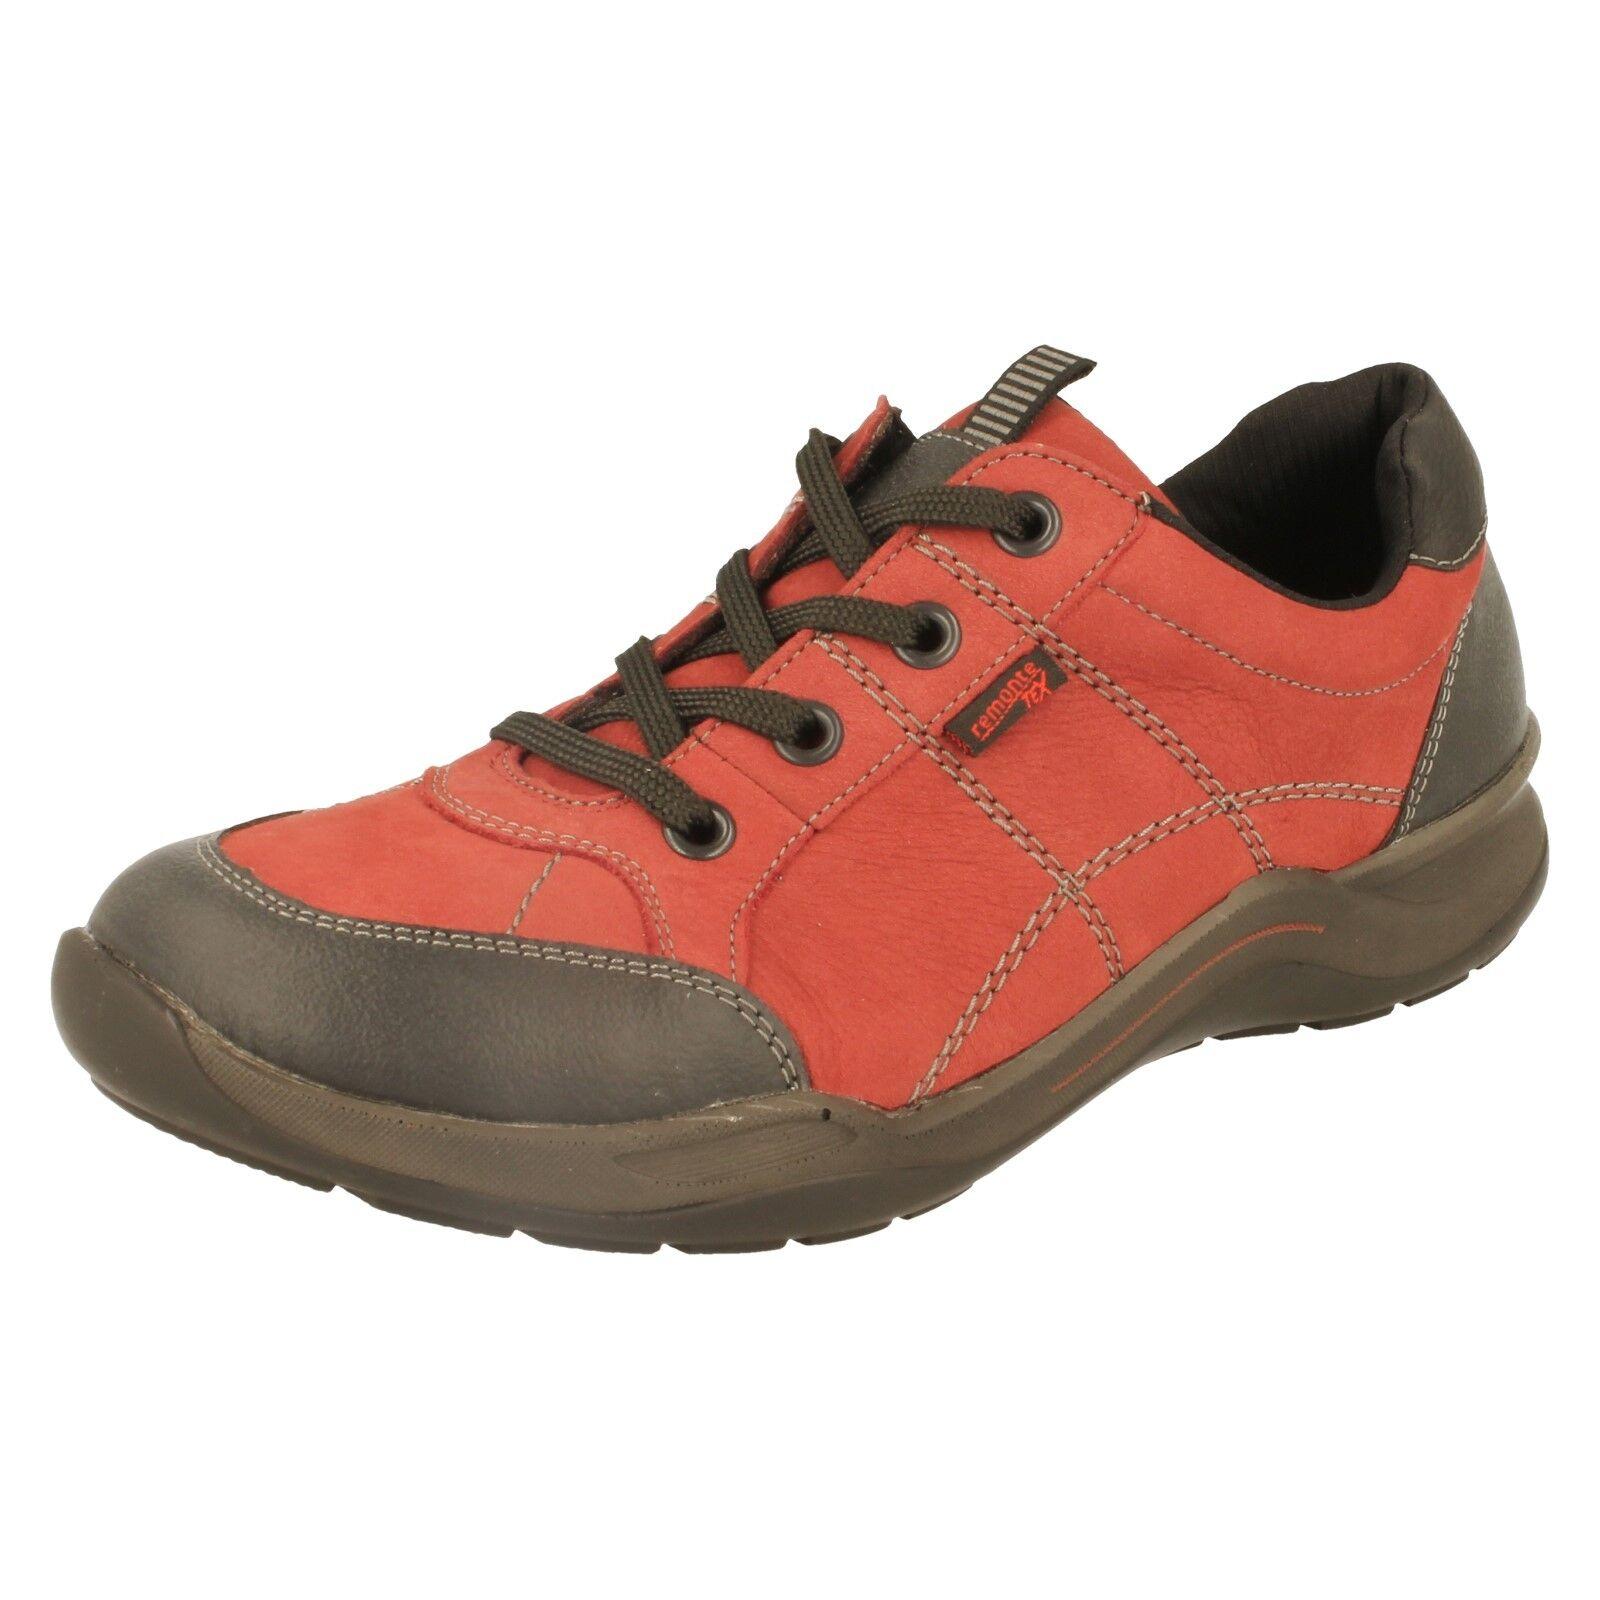 Ladies Remonte Walking shoes - R5404